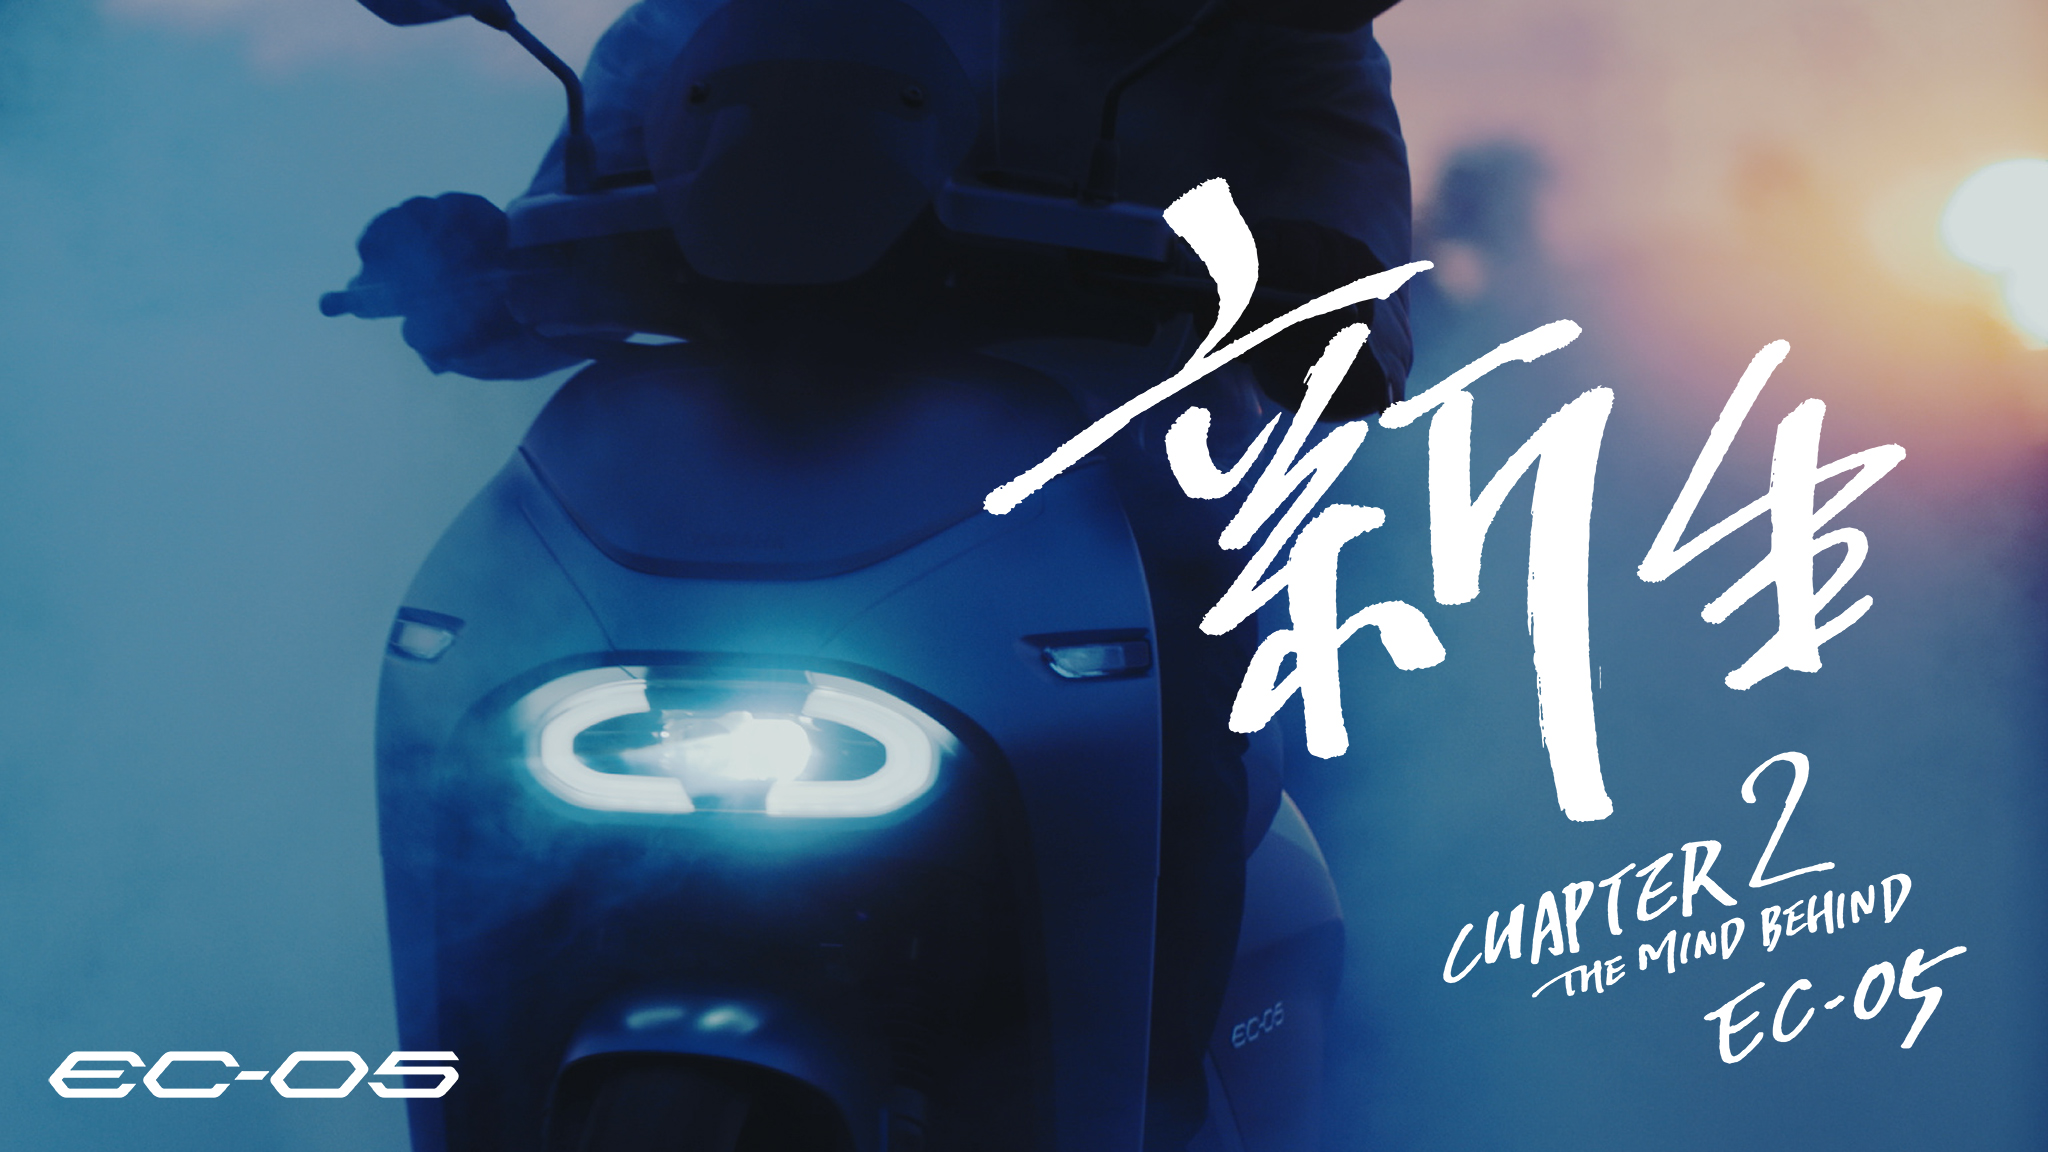 YAMAHA EC-05_05_請務必載明出處Provided by Yamaha Motor Co., Ltd.jpg